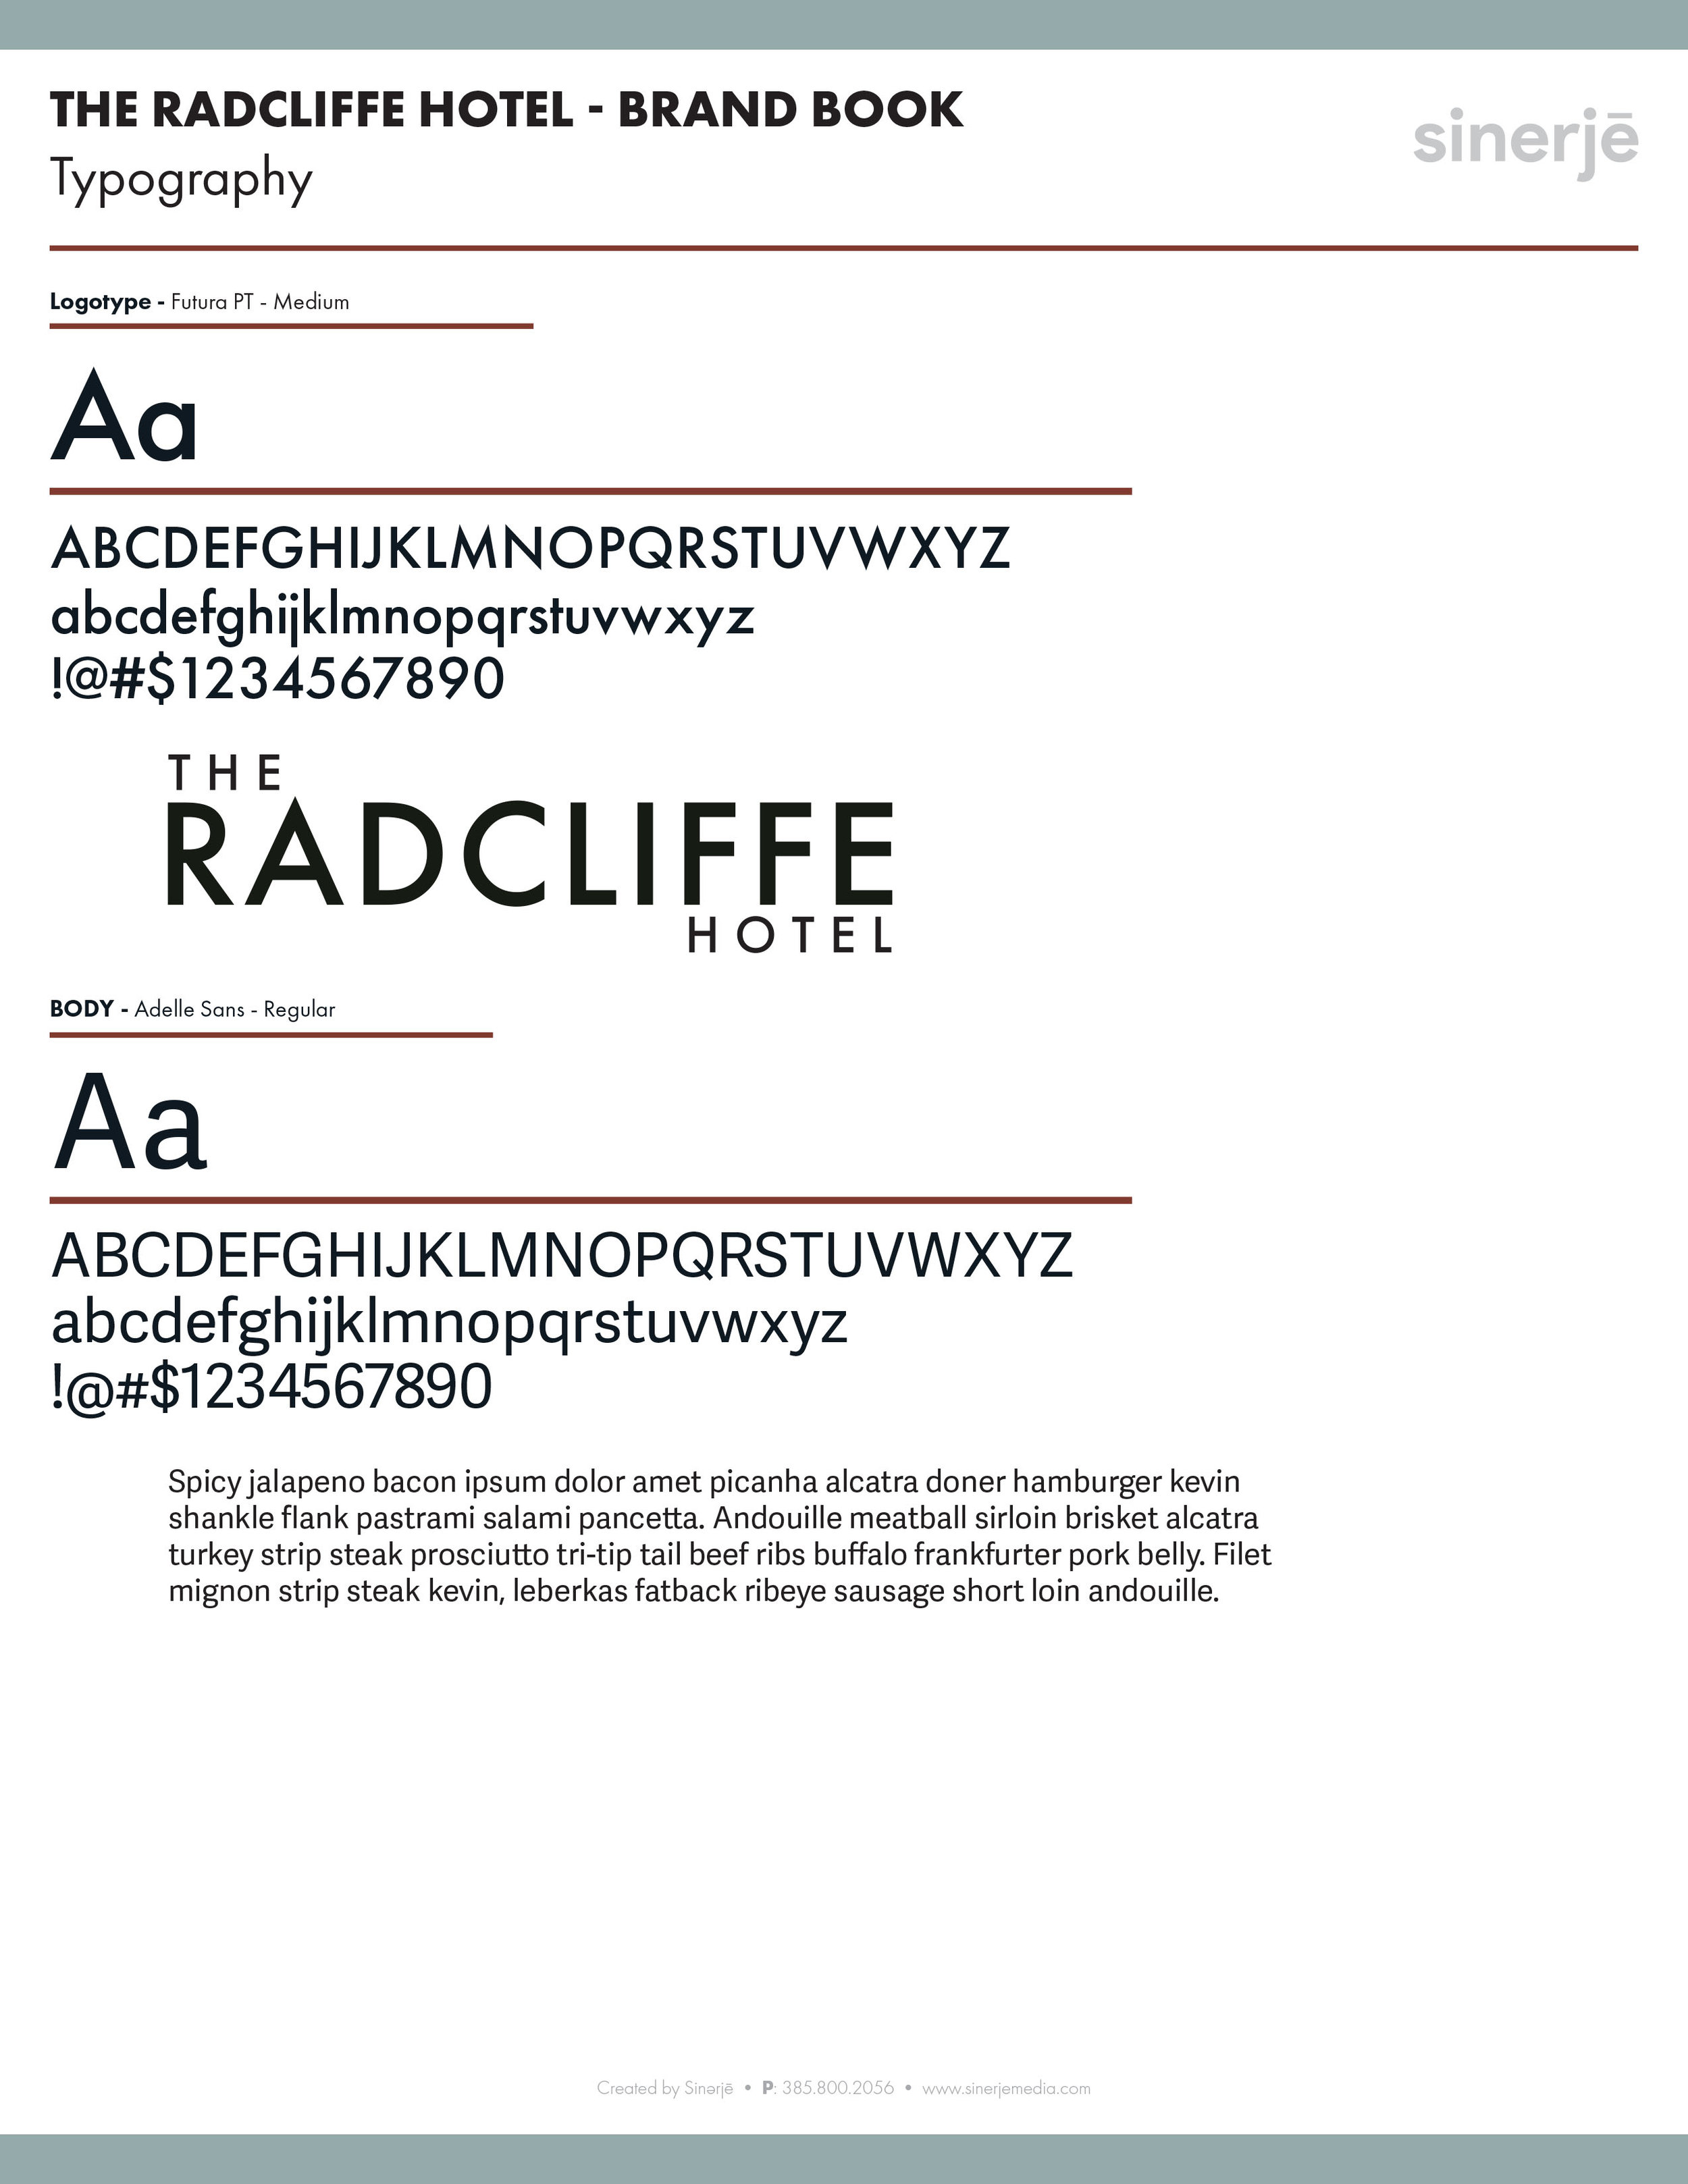 Brand Book Guideline 5.jpg